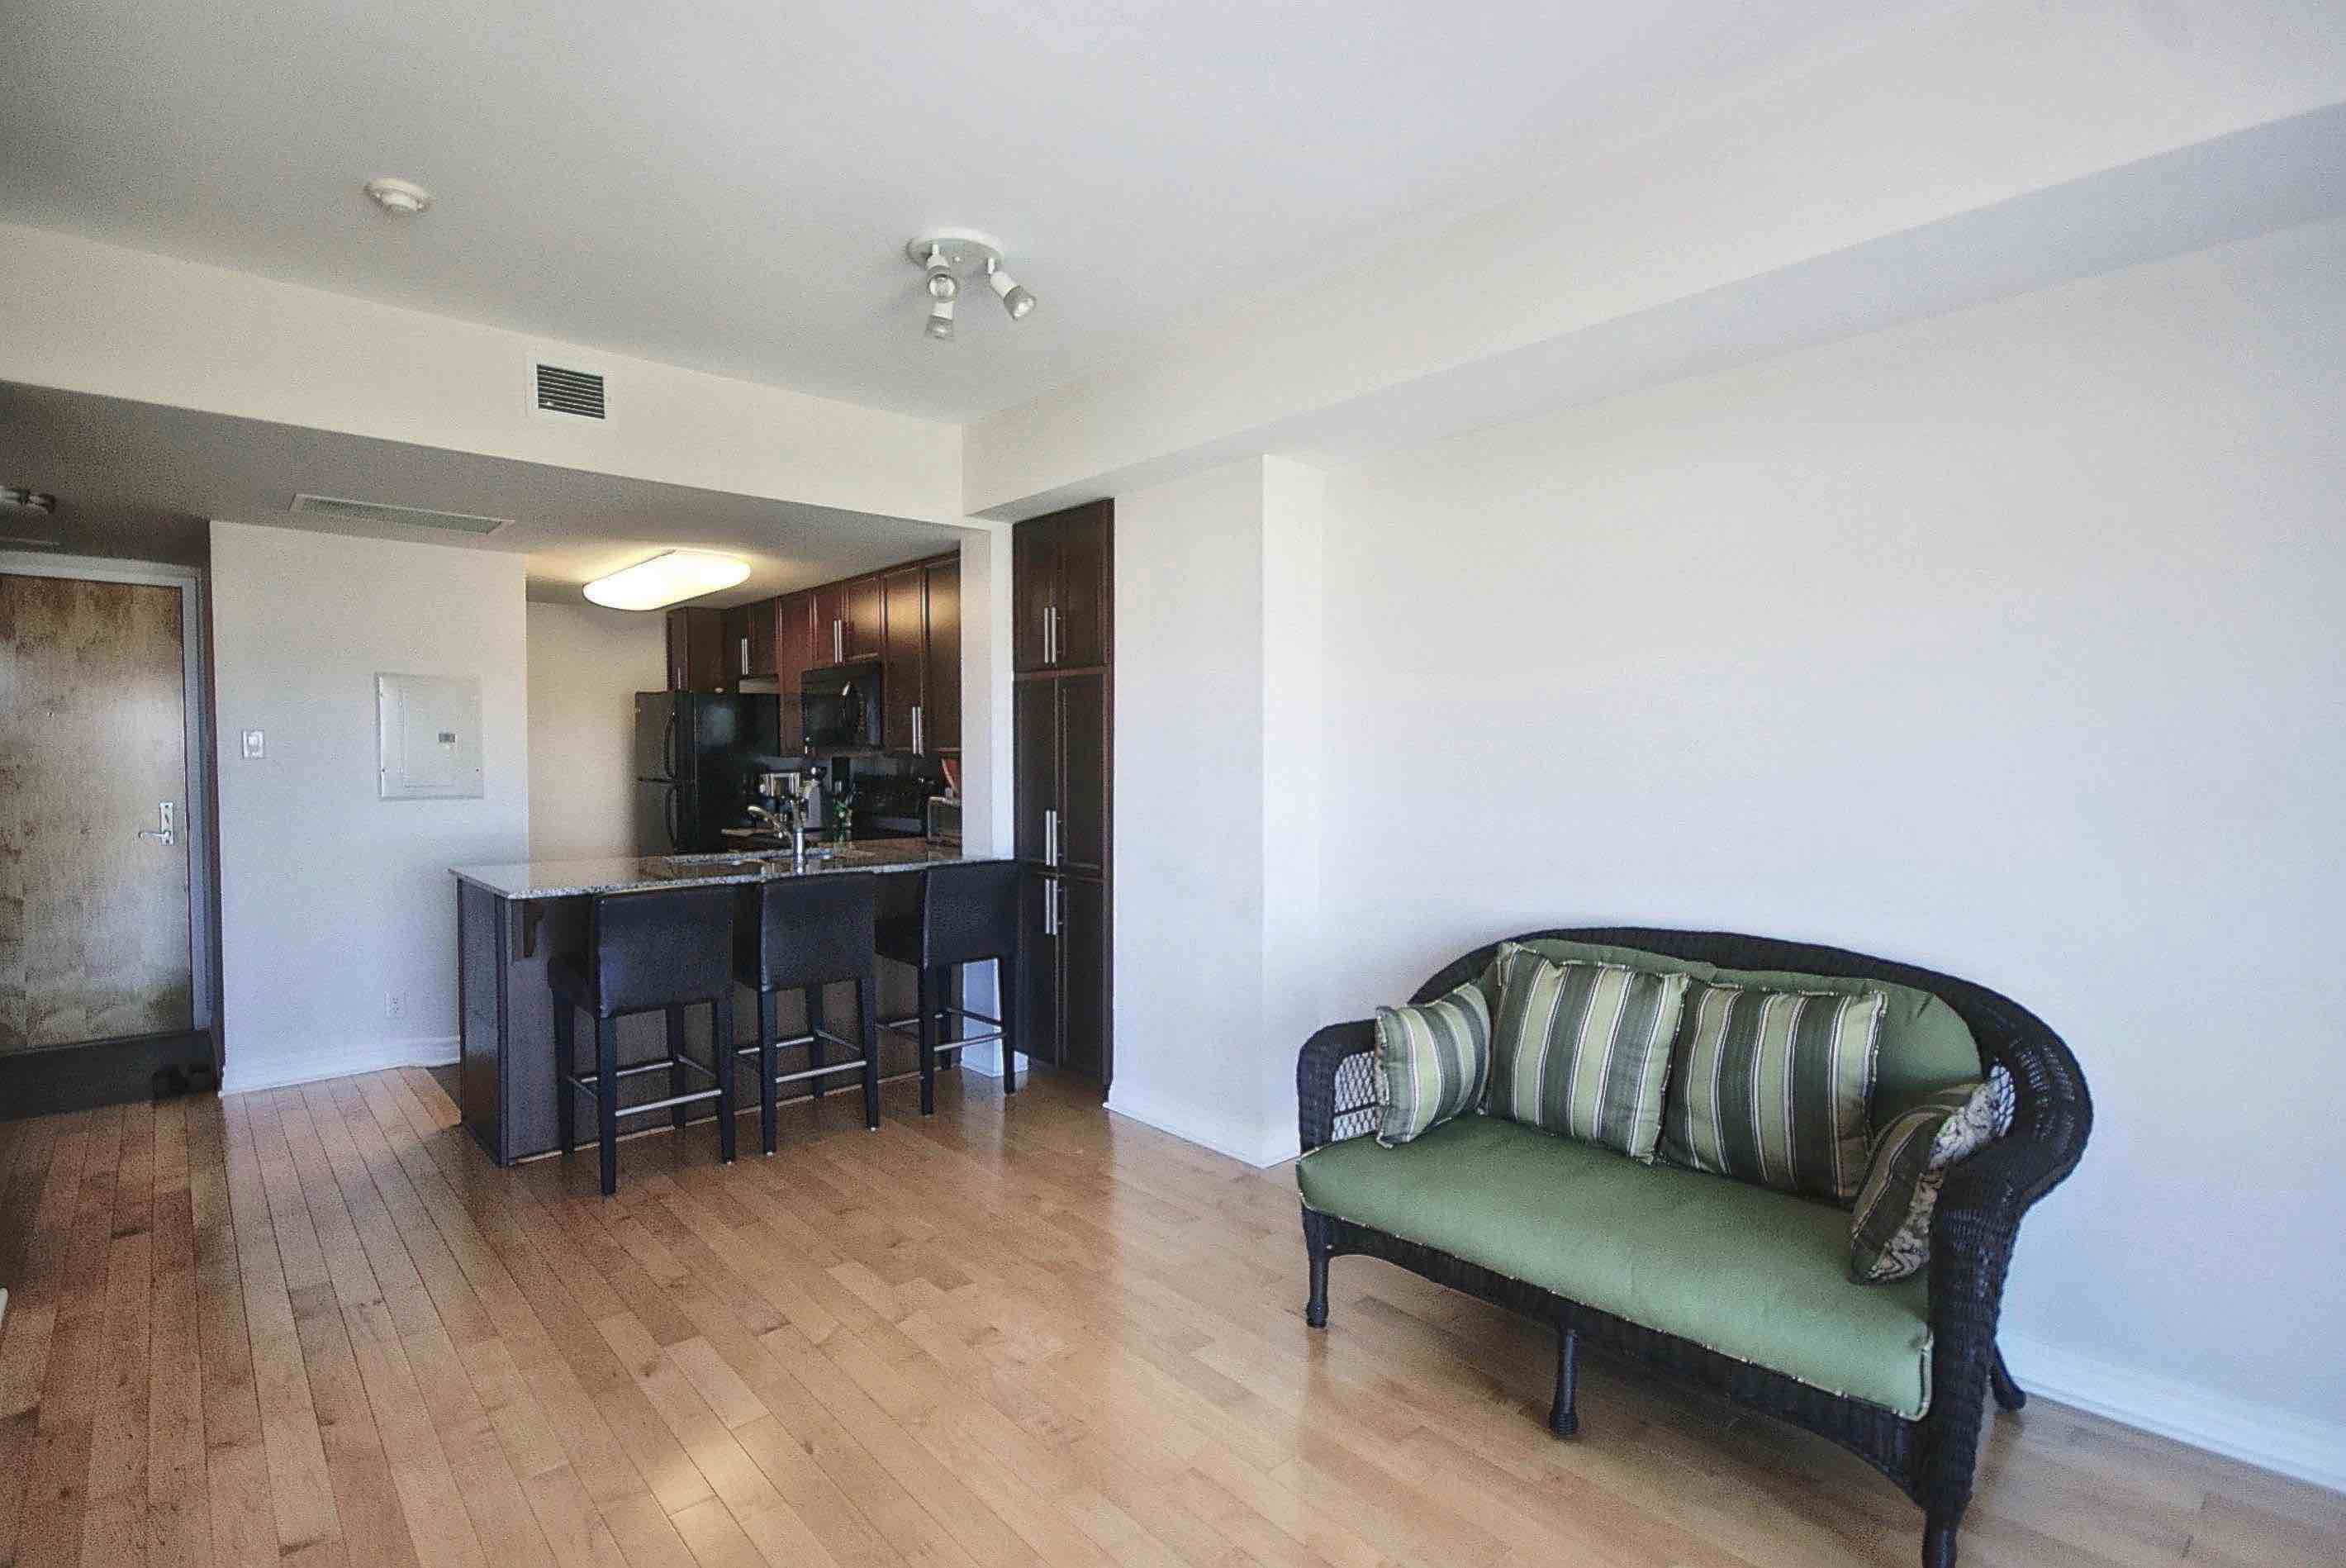 1 Bedroom Bedrooms, 1 Room Rooms,1 BathroomBathrooms,Condo - Apartment,For Rent,1030